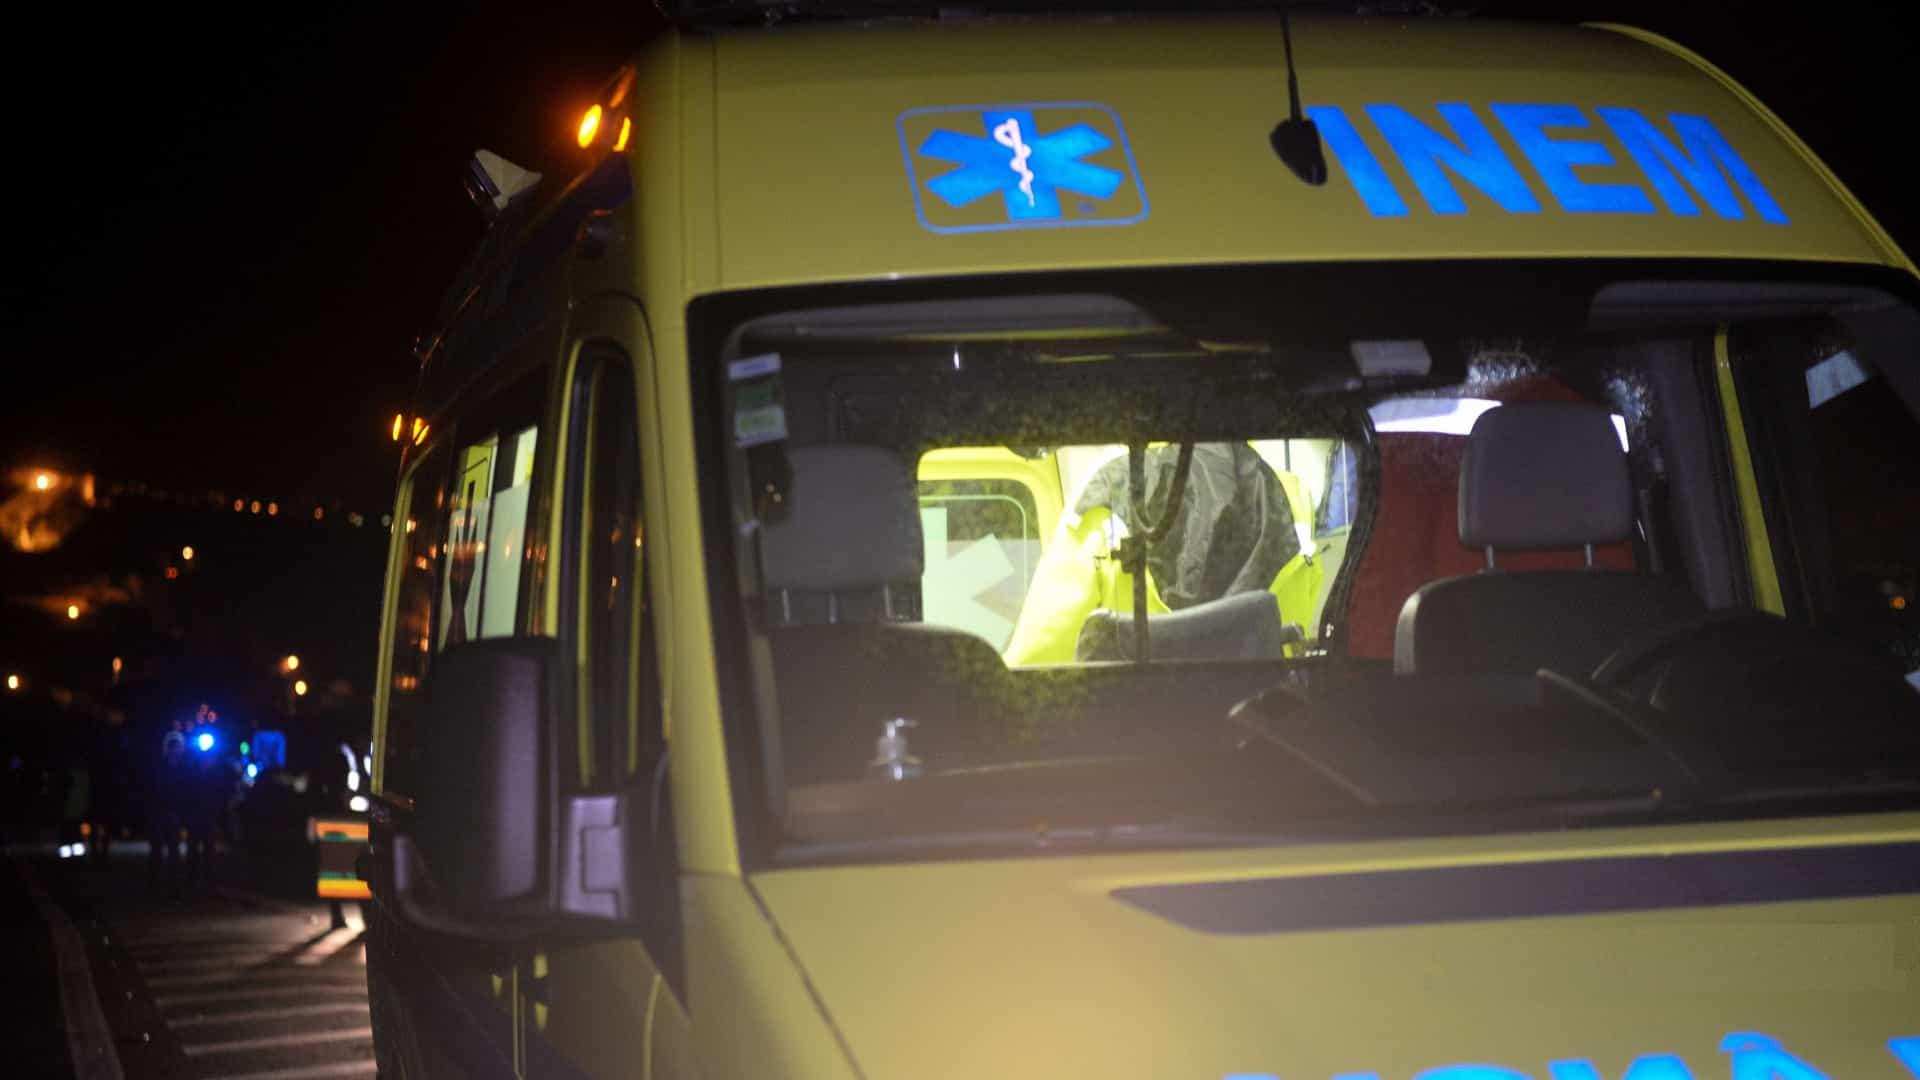 BRAGA - Investigadores dizem que morte de jovem moldavo deve ter sido suicídio